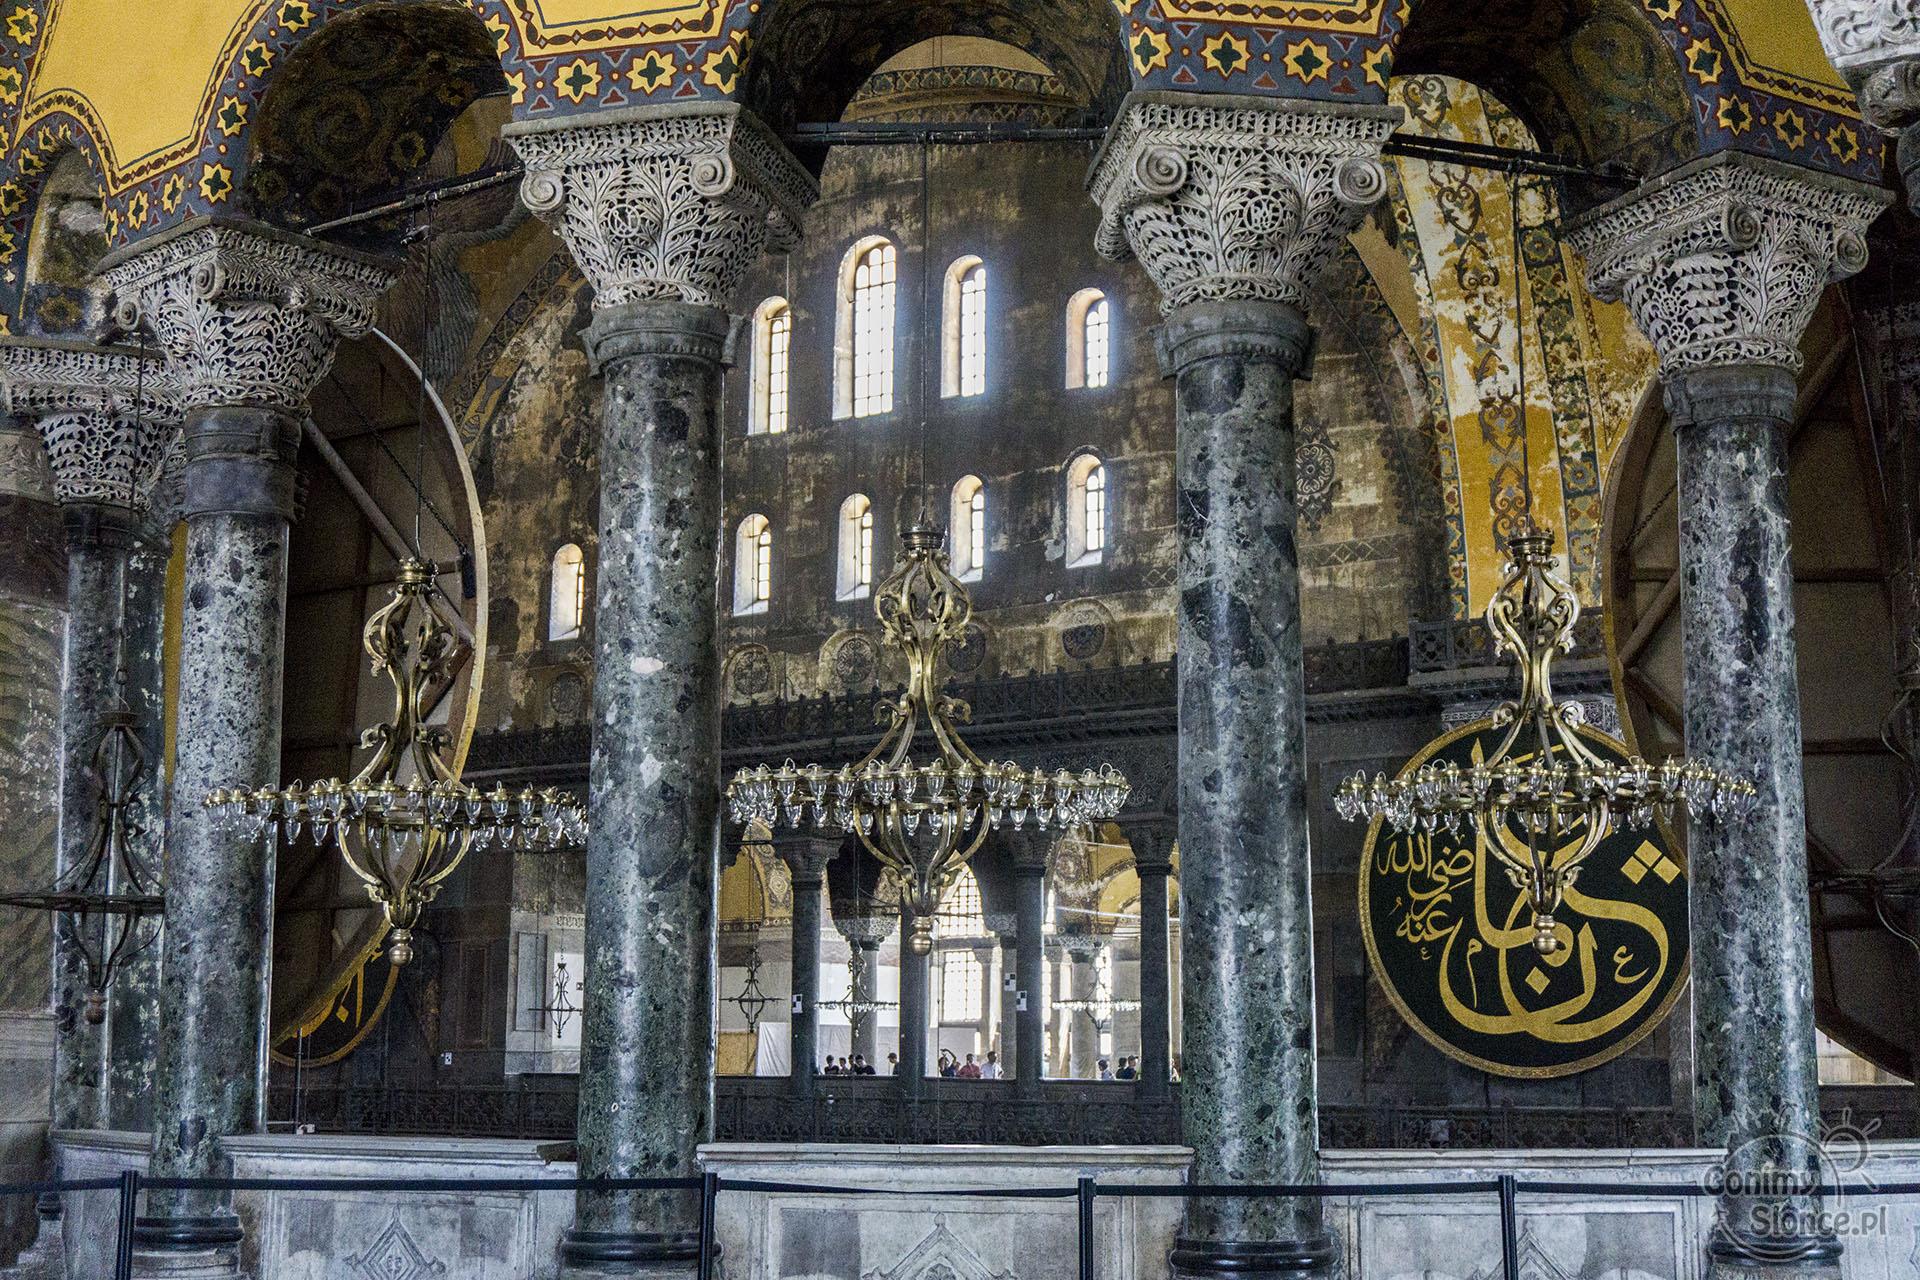 Hagia Sophia wnętrze, Stambuł - GonimySlonce.pl